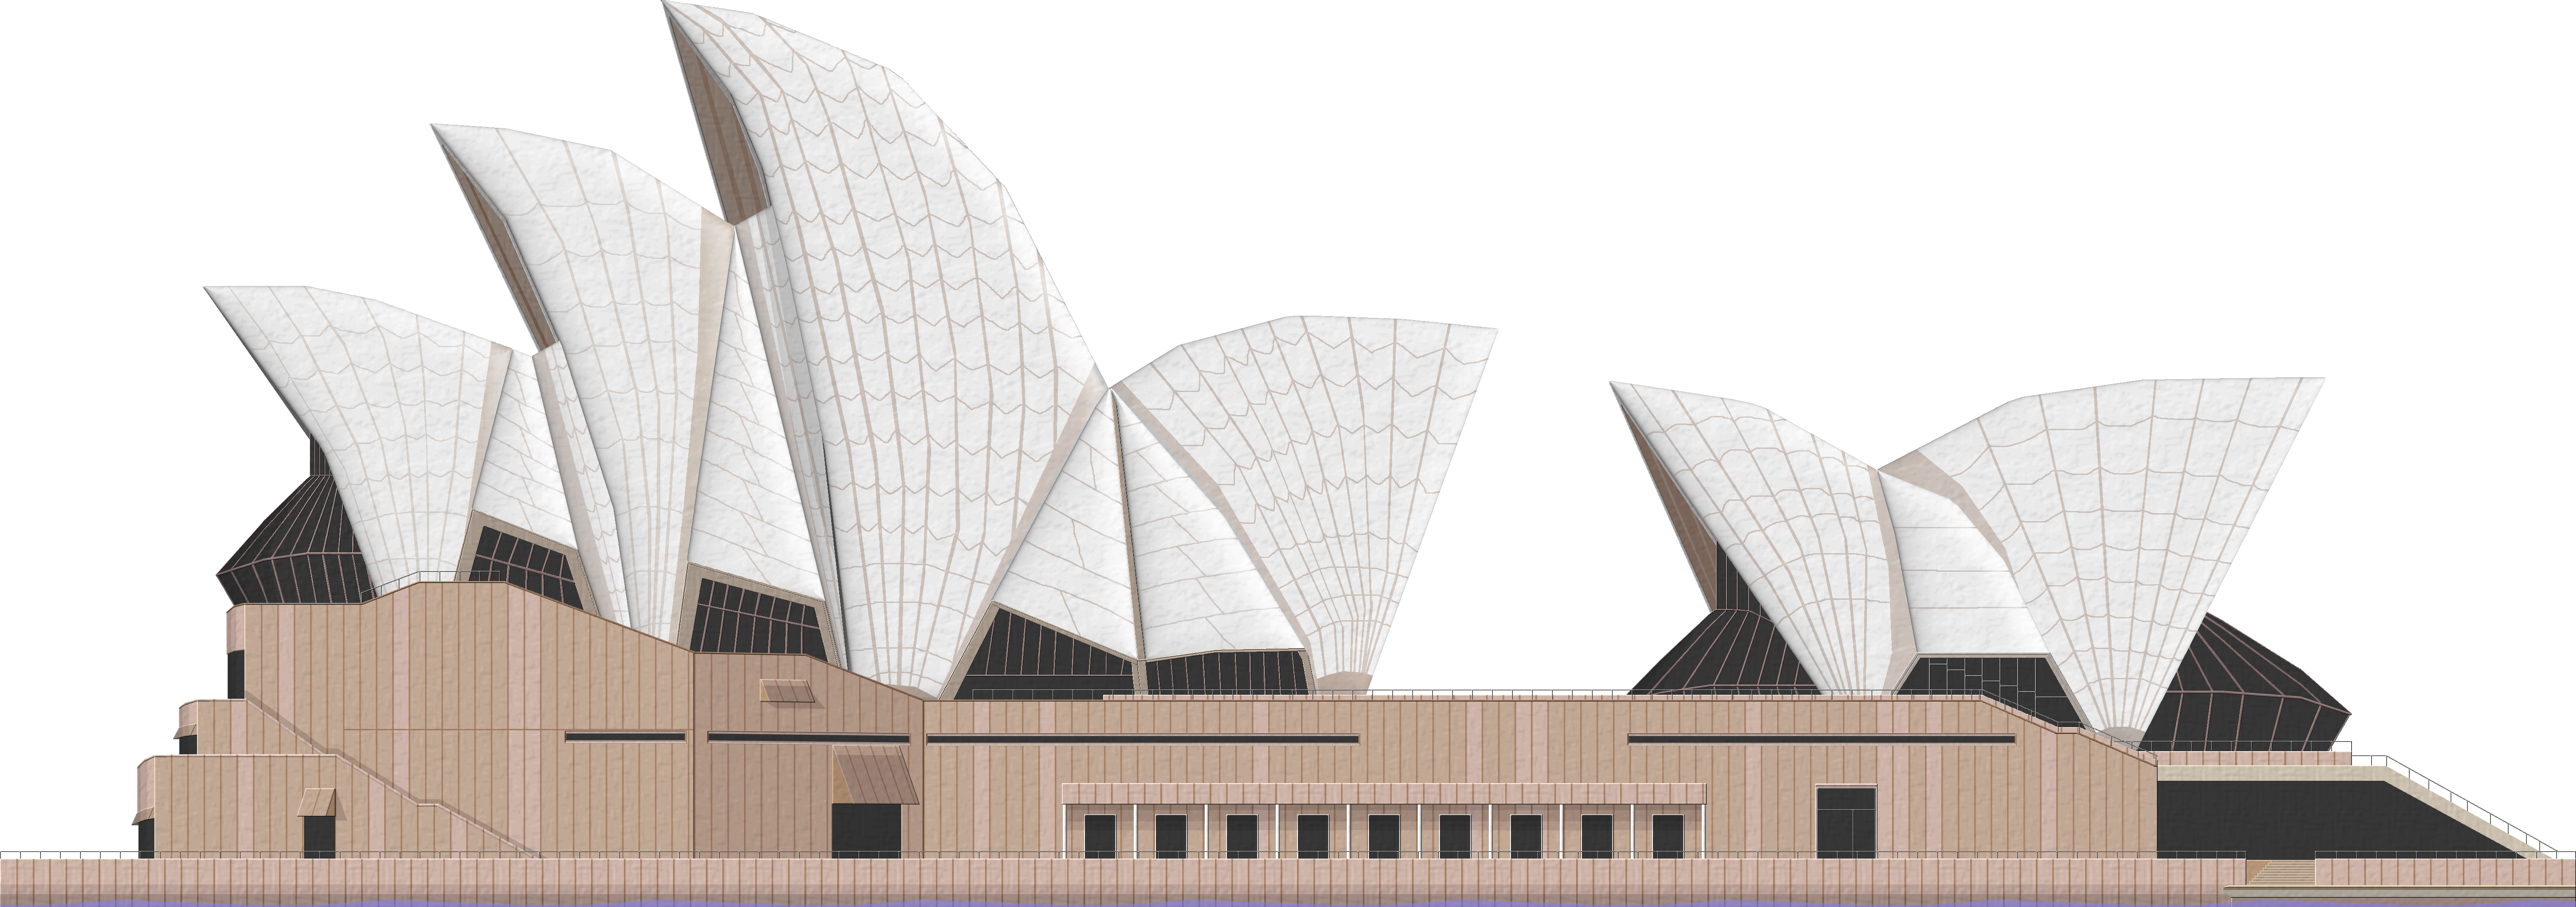 Sydney Opera House PNG File.